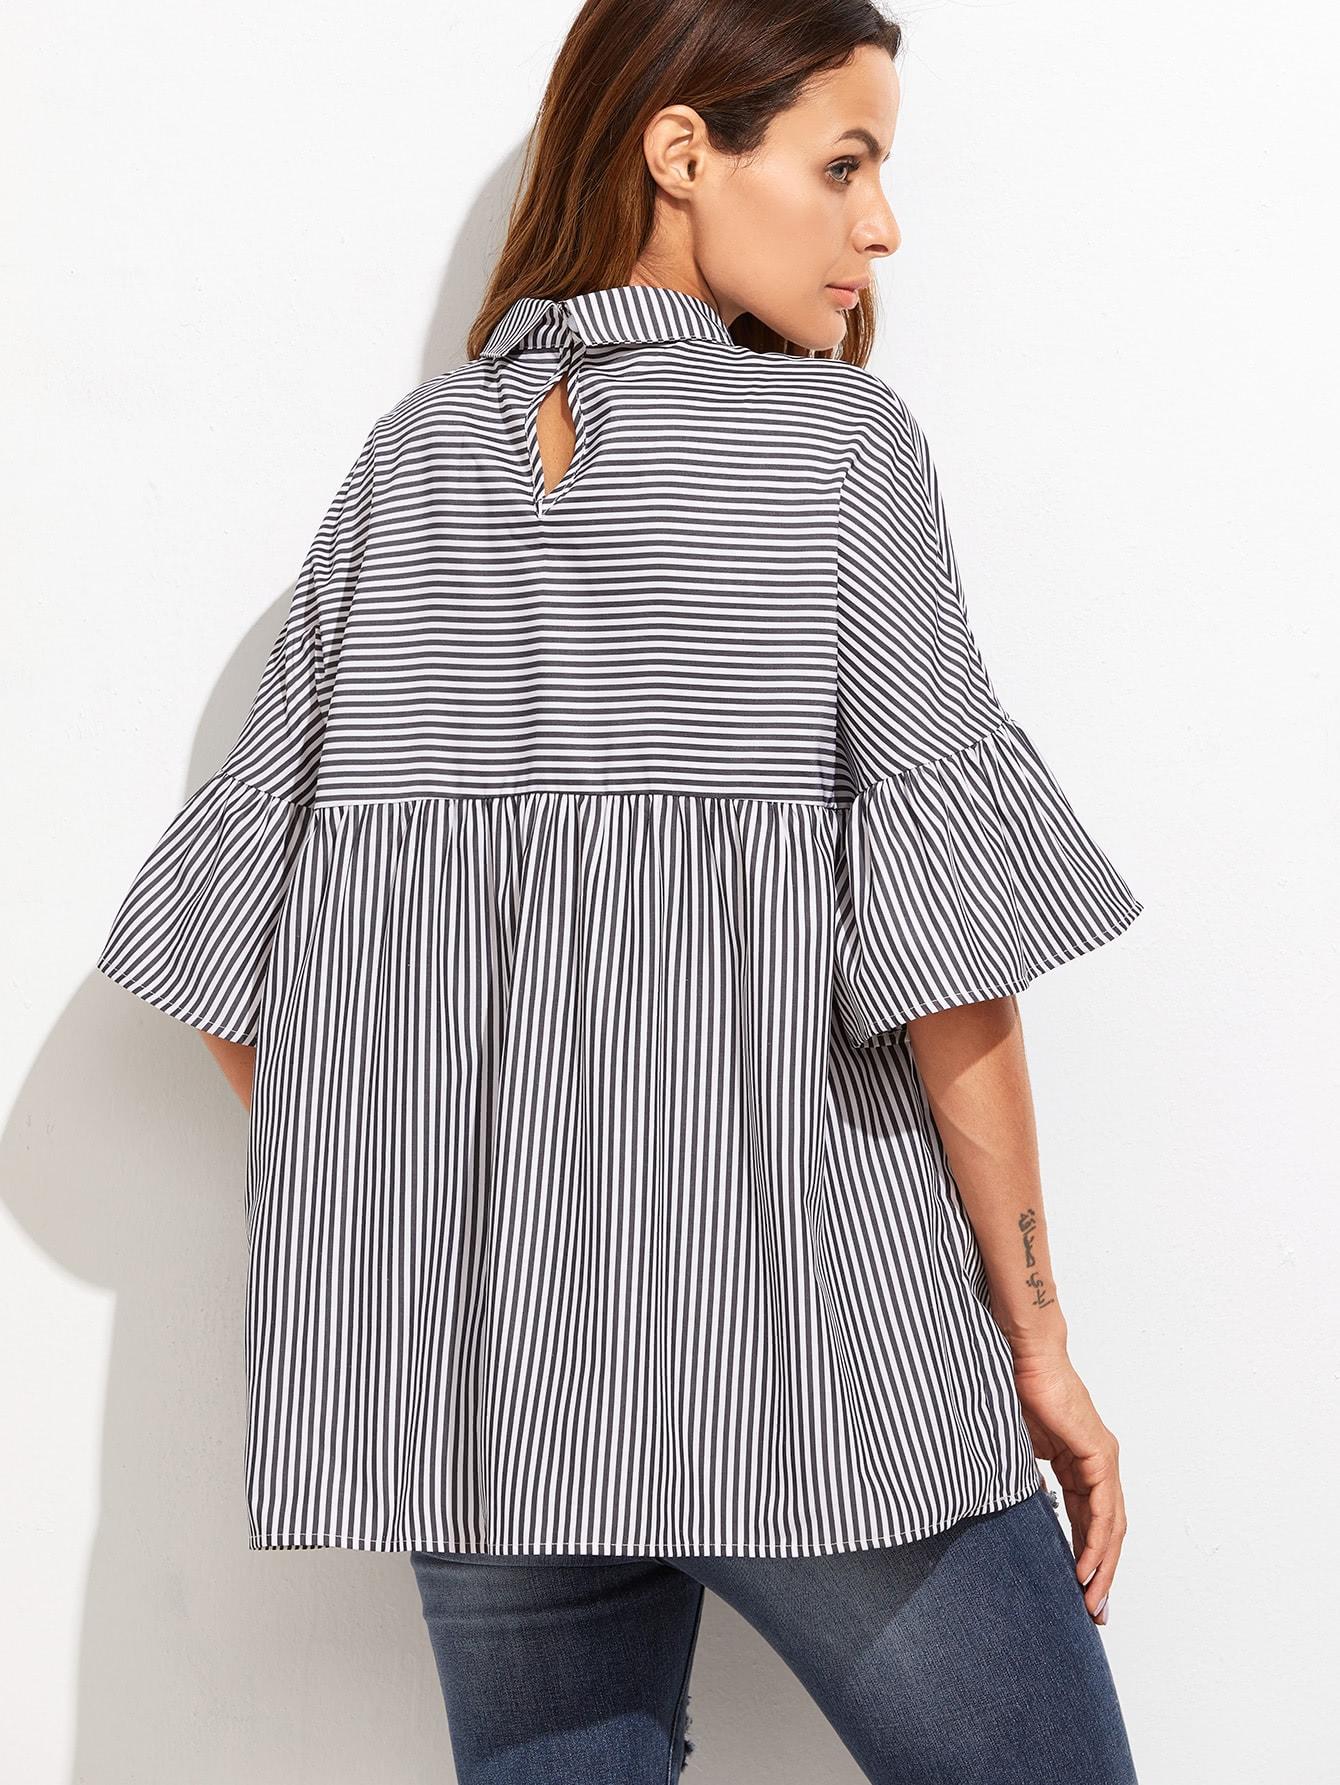 blouse161012705_2